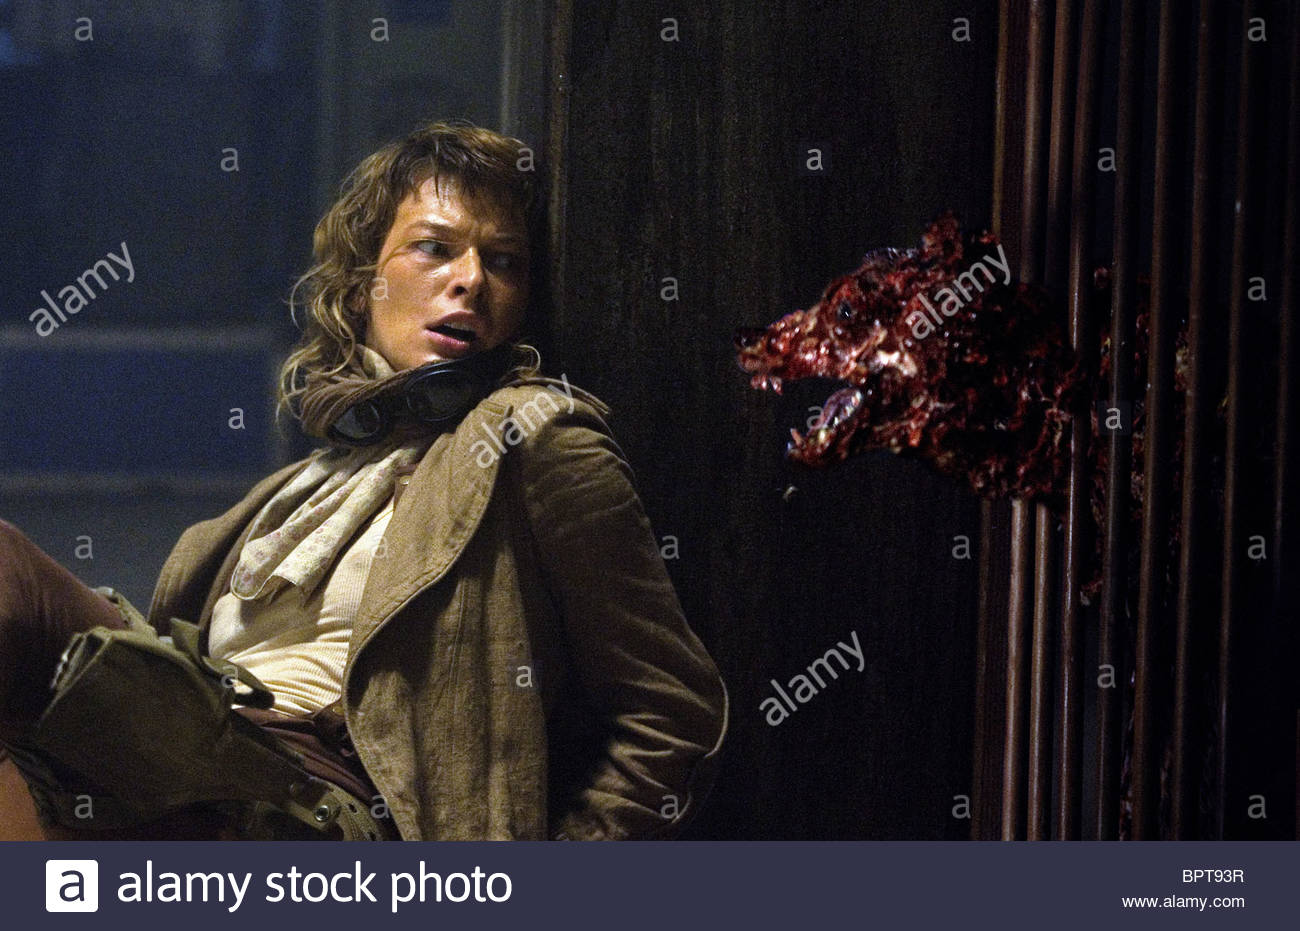 MILLA JOVOVICH RESIDEN... Milla Jovovich Resident Evil 3